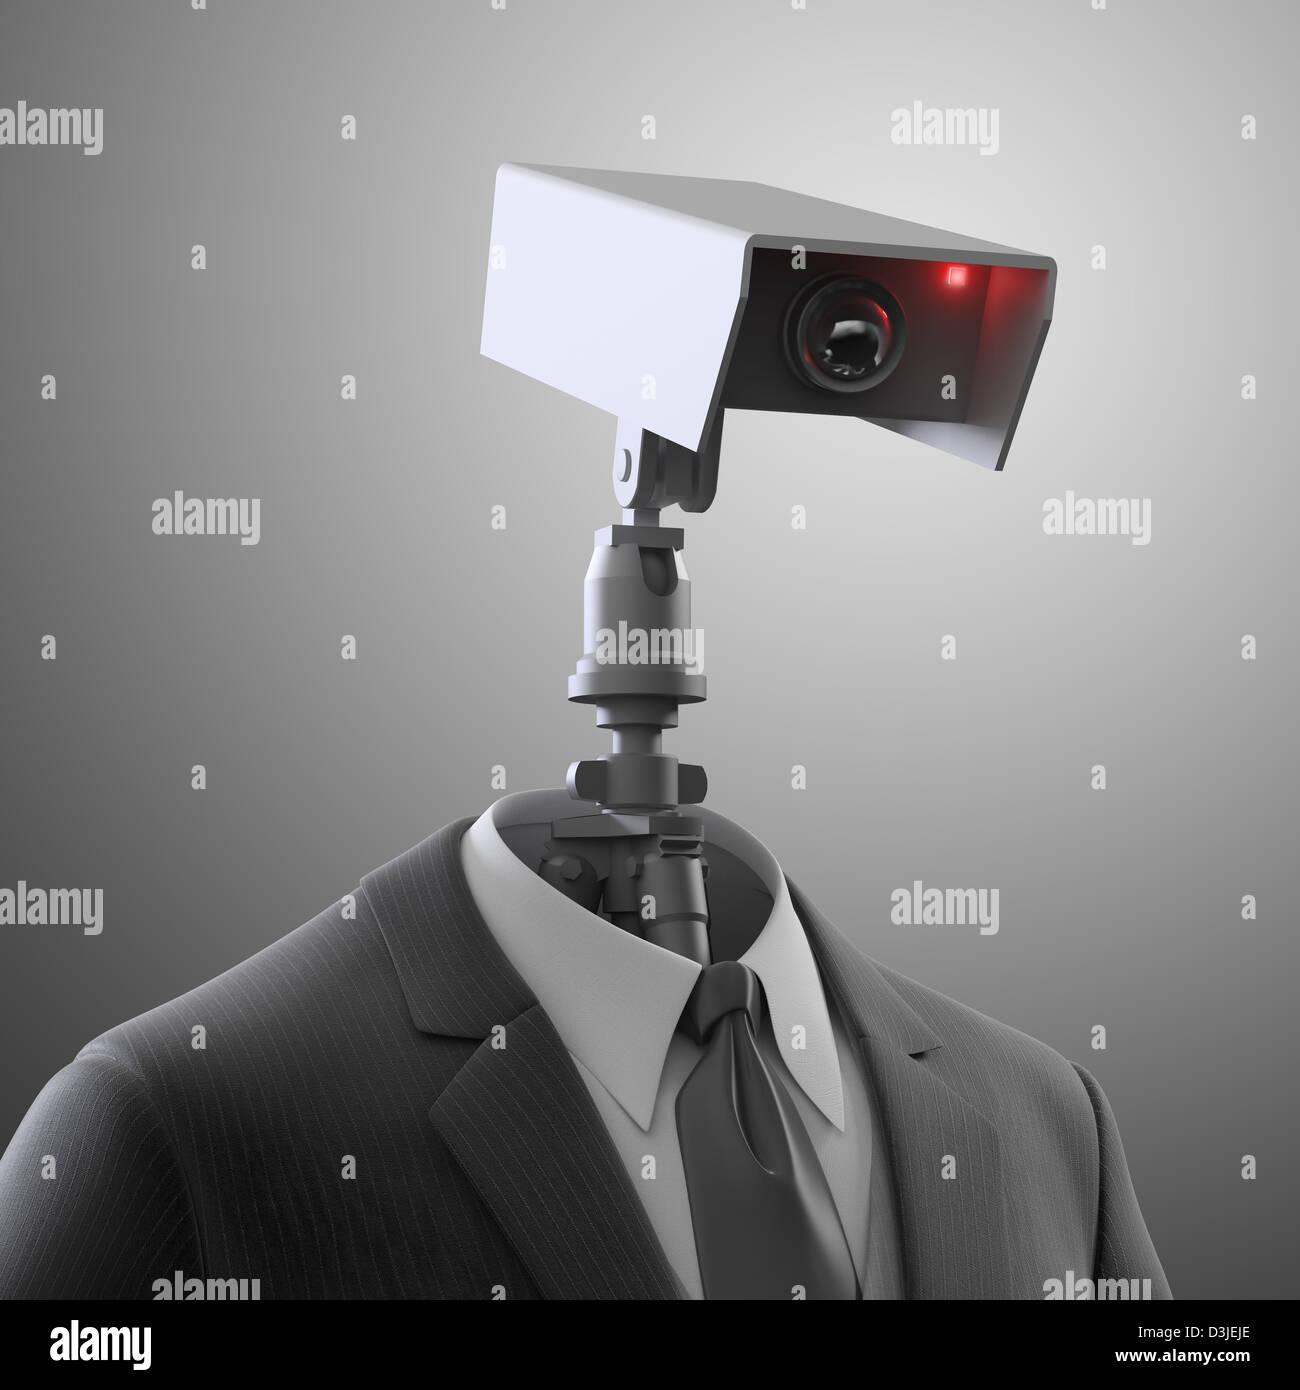 A robotic security camera - automated surveillance Stock Photo